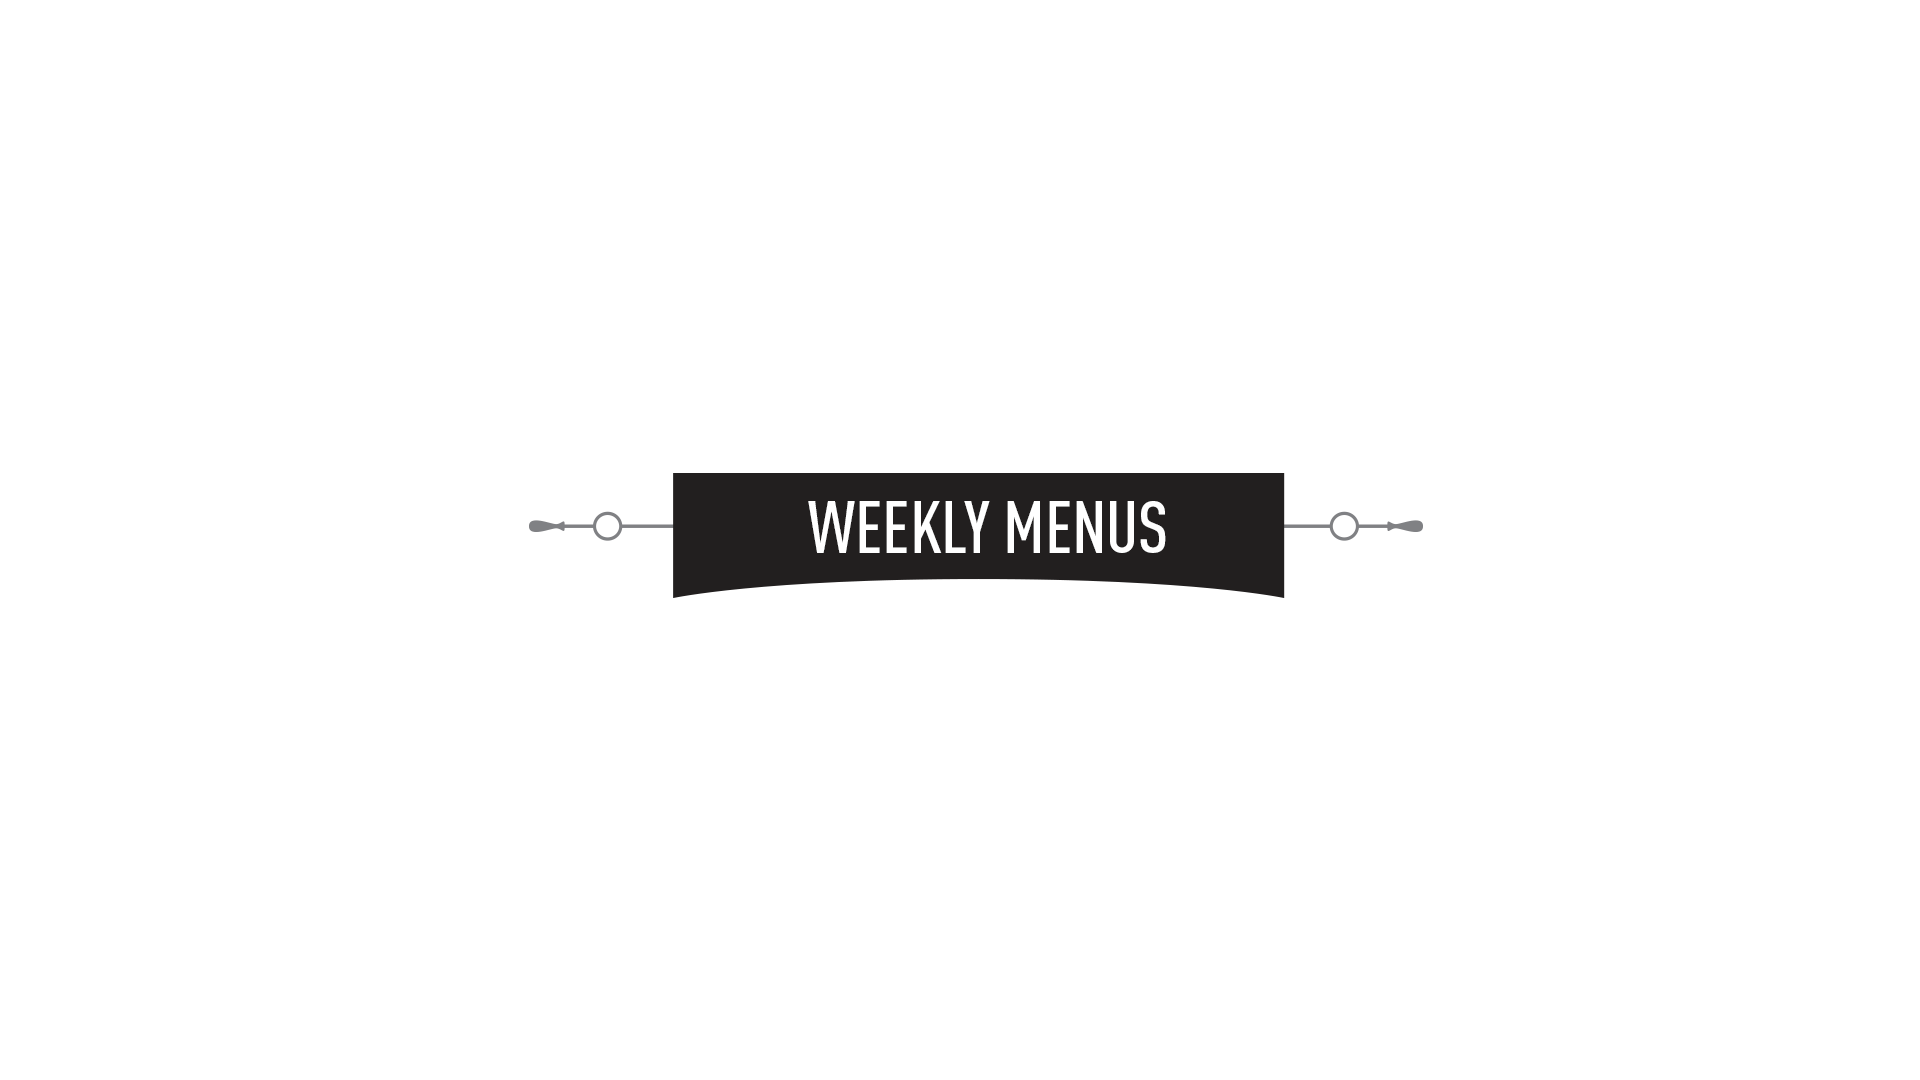 menu-title.png